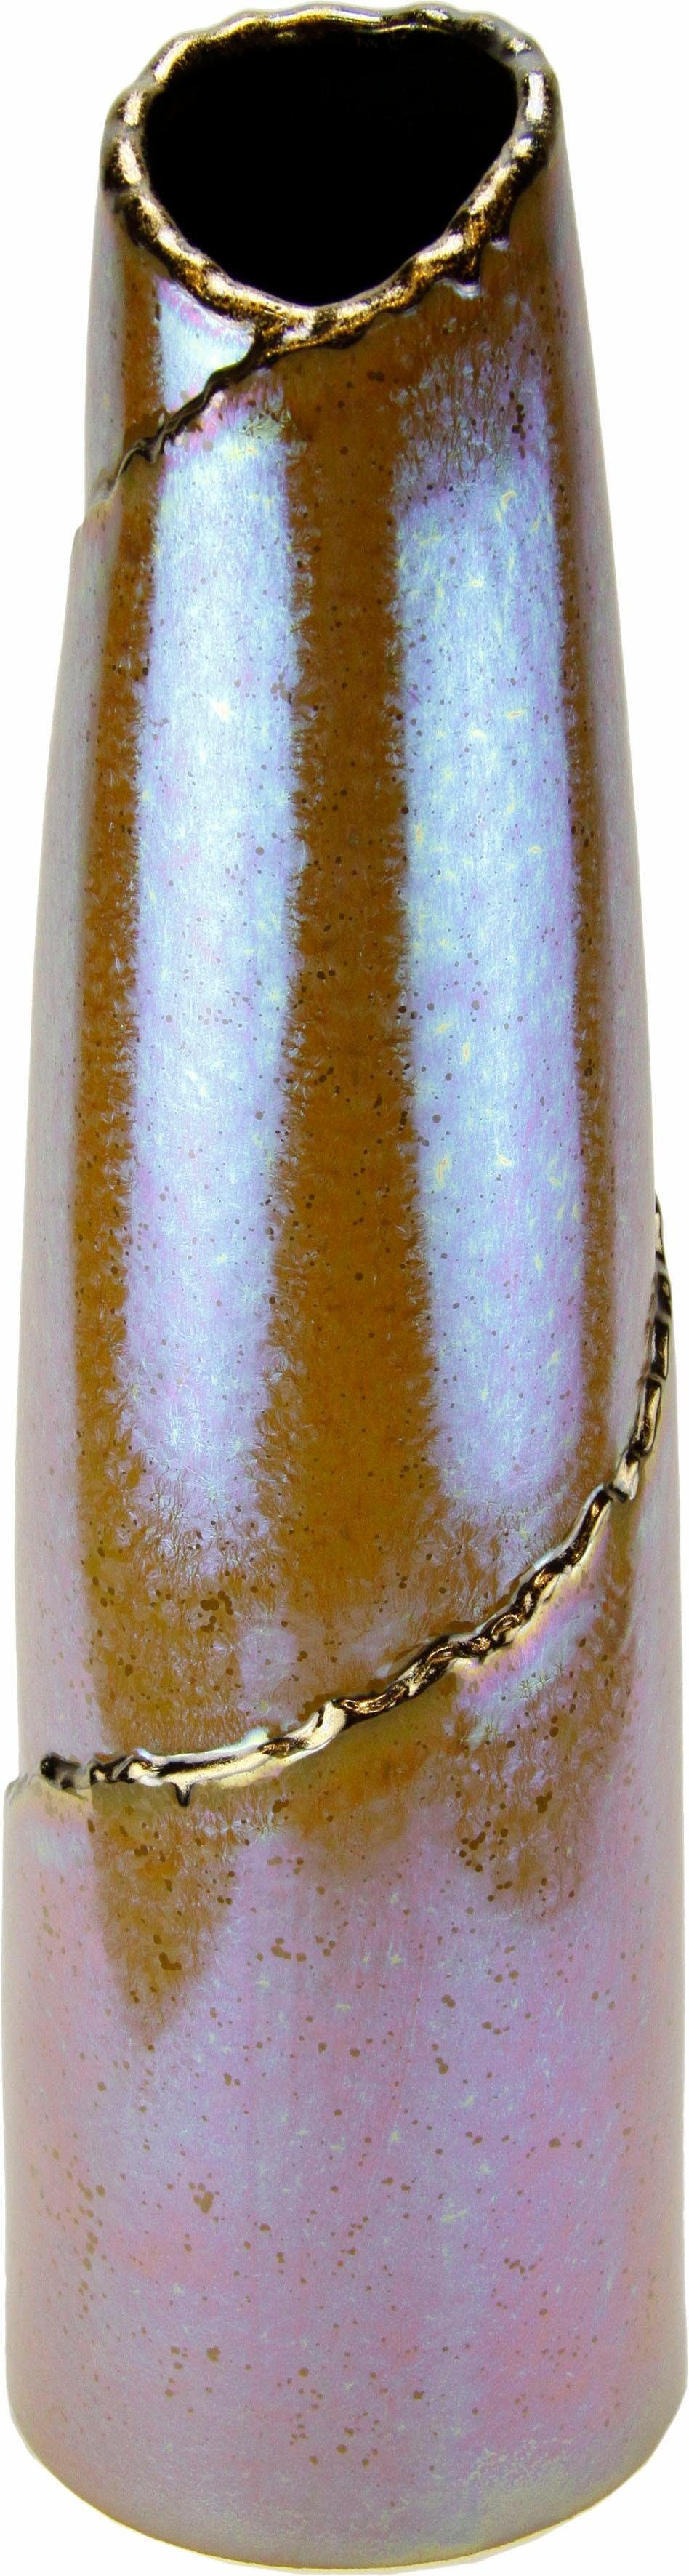 Home Affaire Keramik-Vase de Luxe 50/13cm